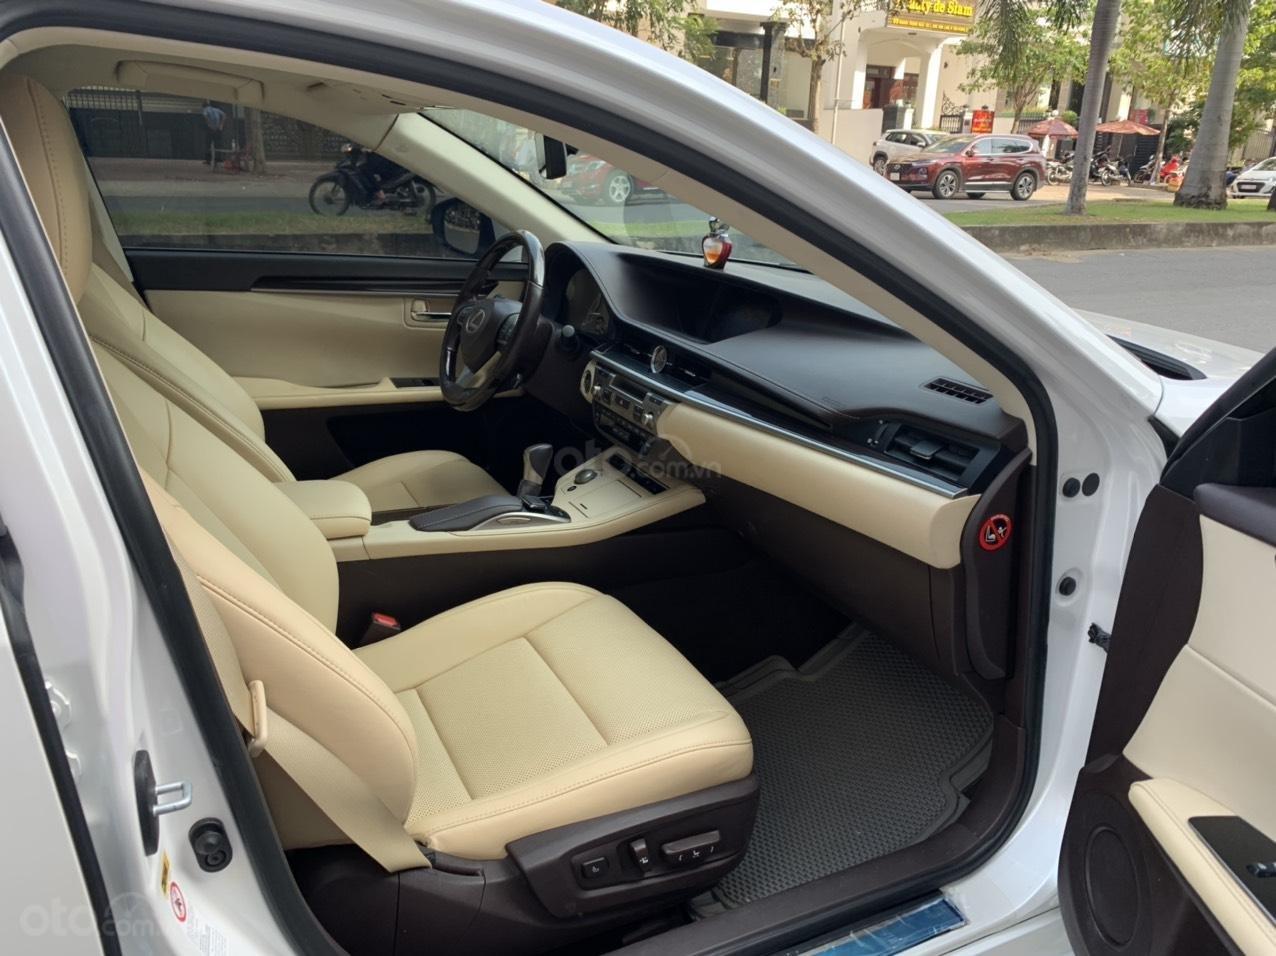 Bán Lexus ES 350 model 2016 giá 1 tỷ 790 tại HCM (3)